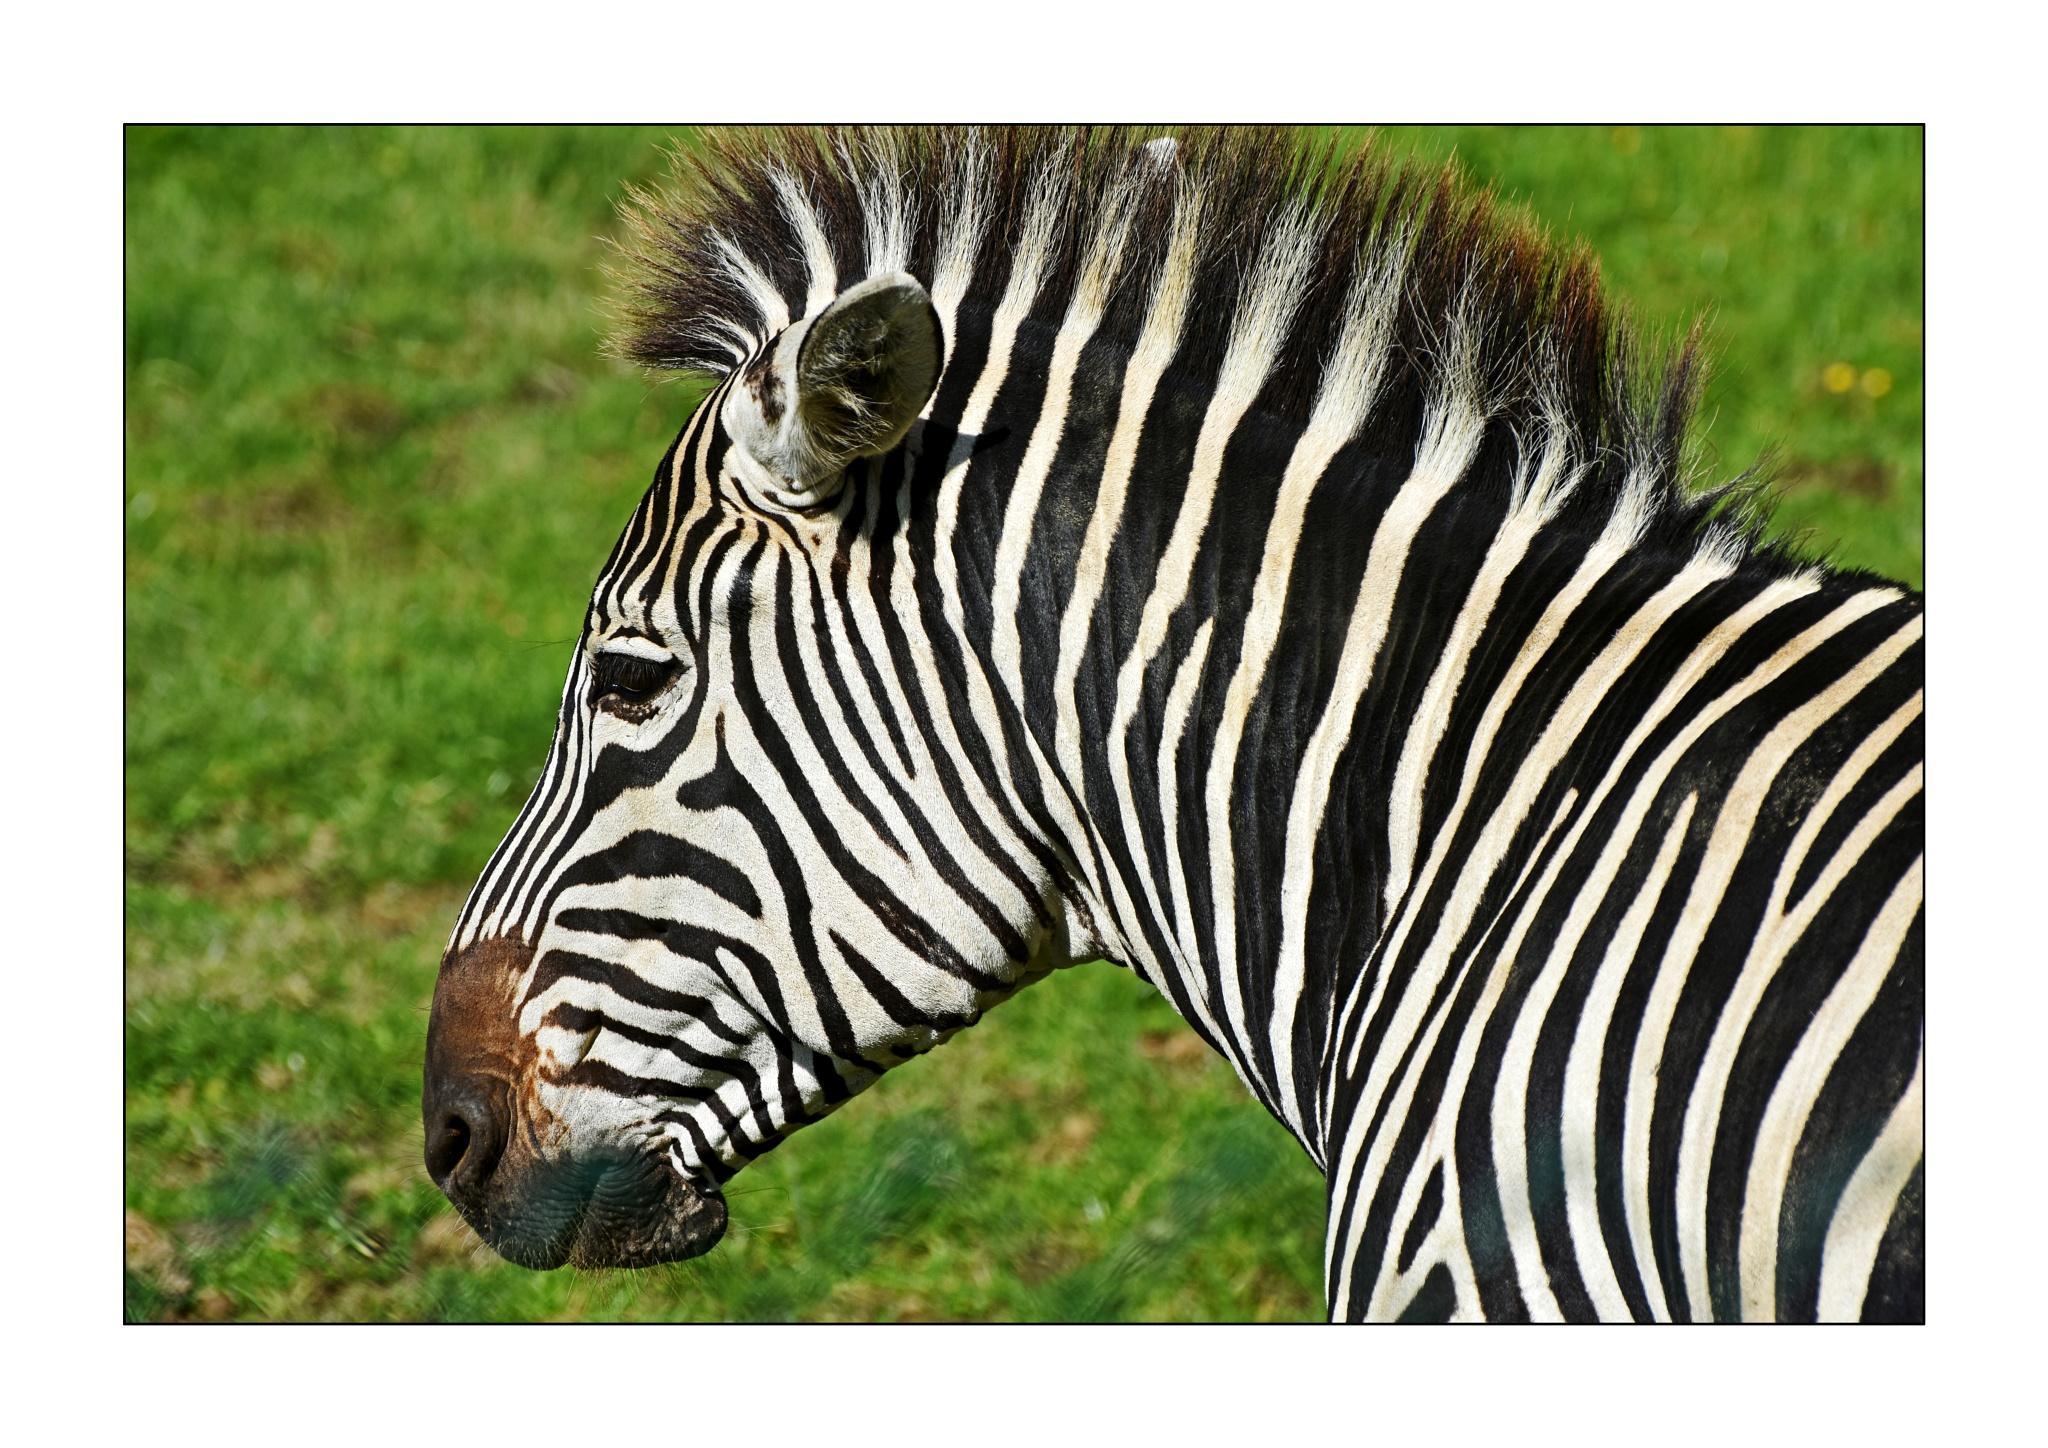 Stripie Donkey by Trevor Robinson